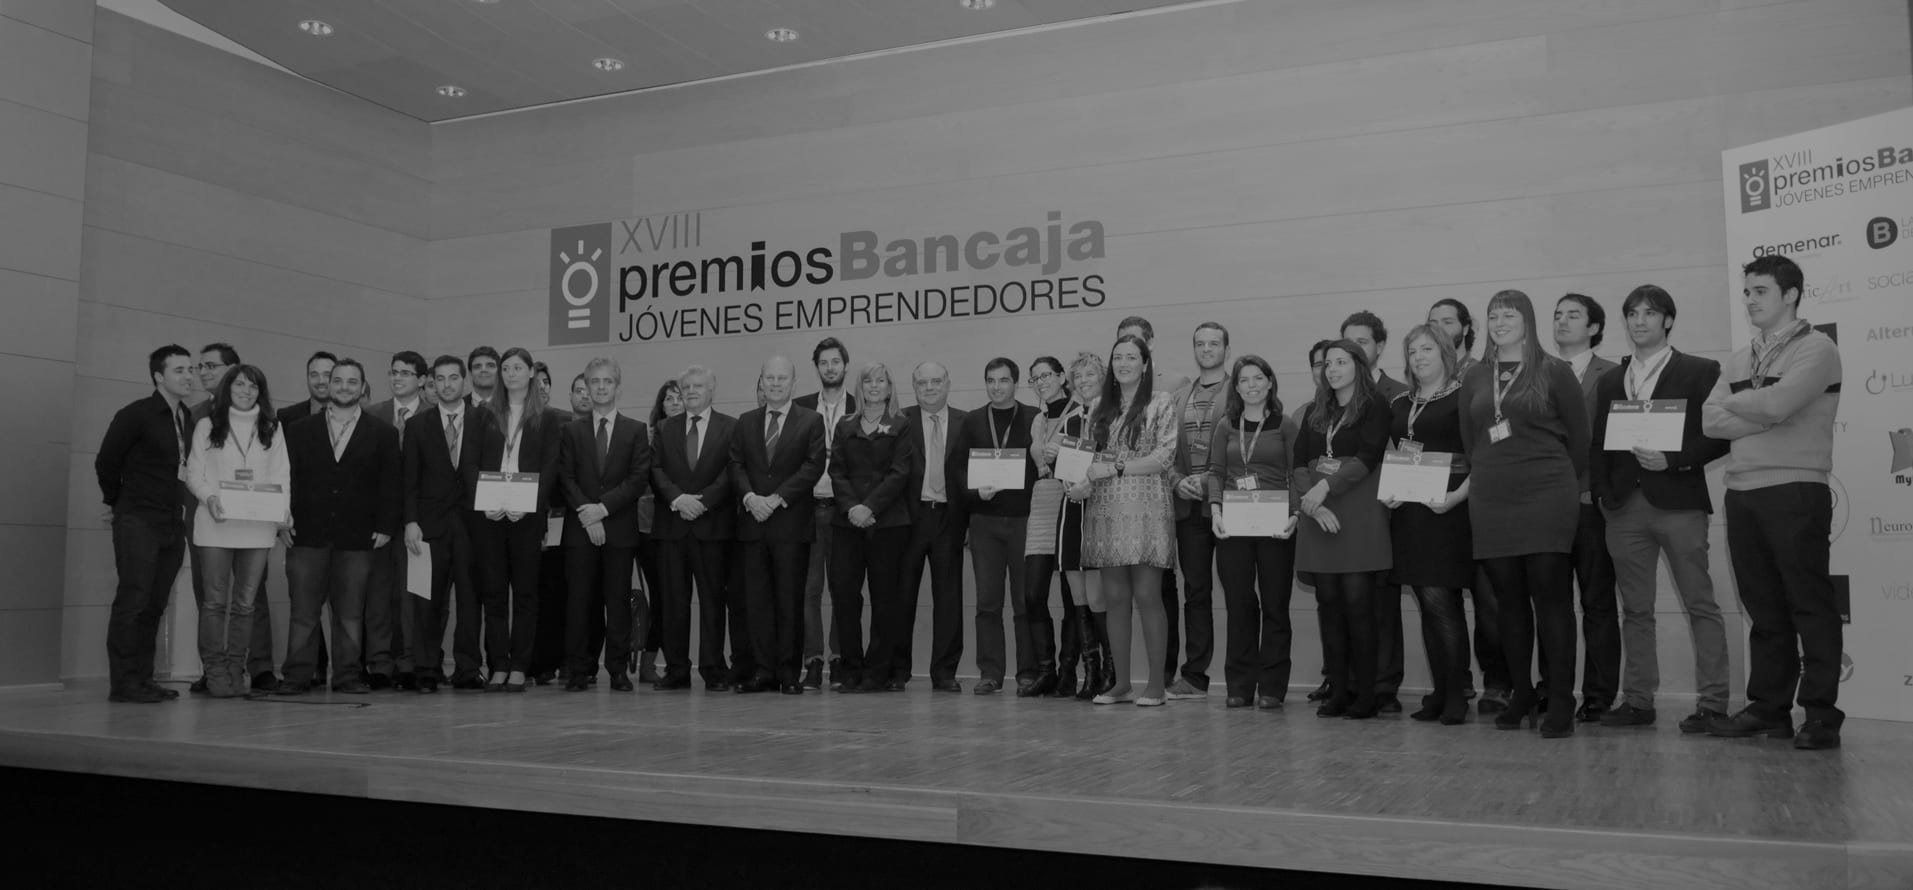 Cuatroochenta wins Bancaja's award